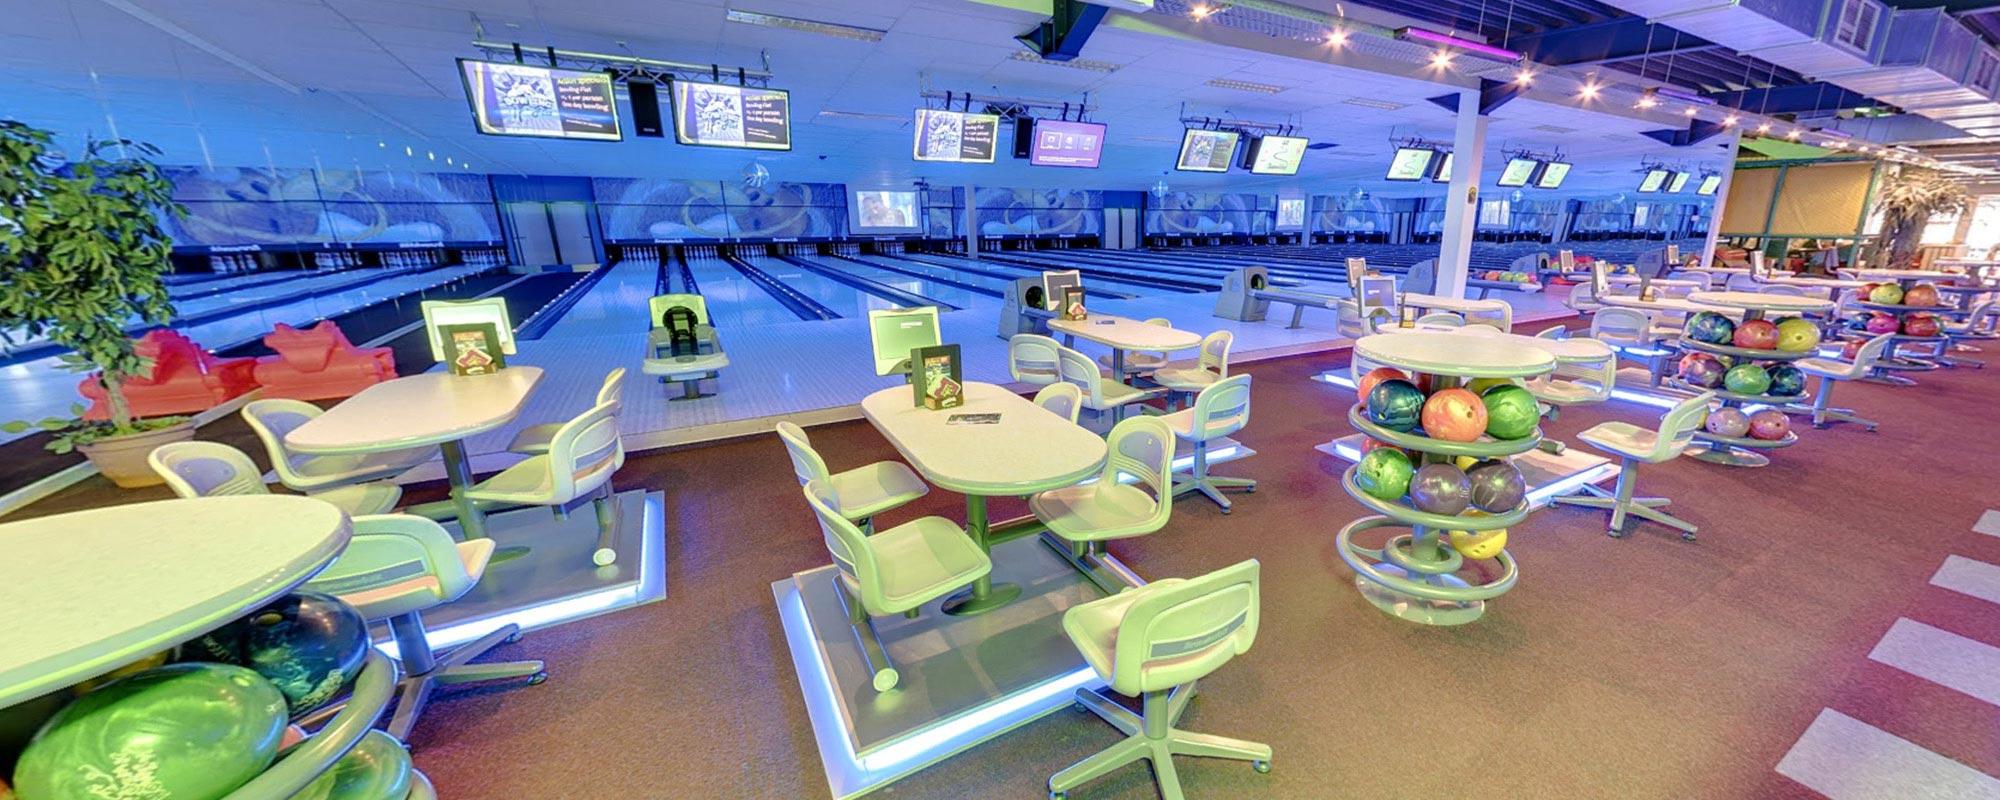 ebafkc-bowling-2000x800-01